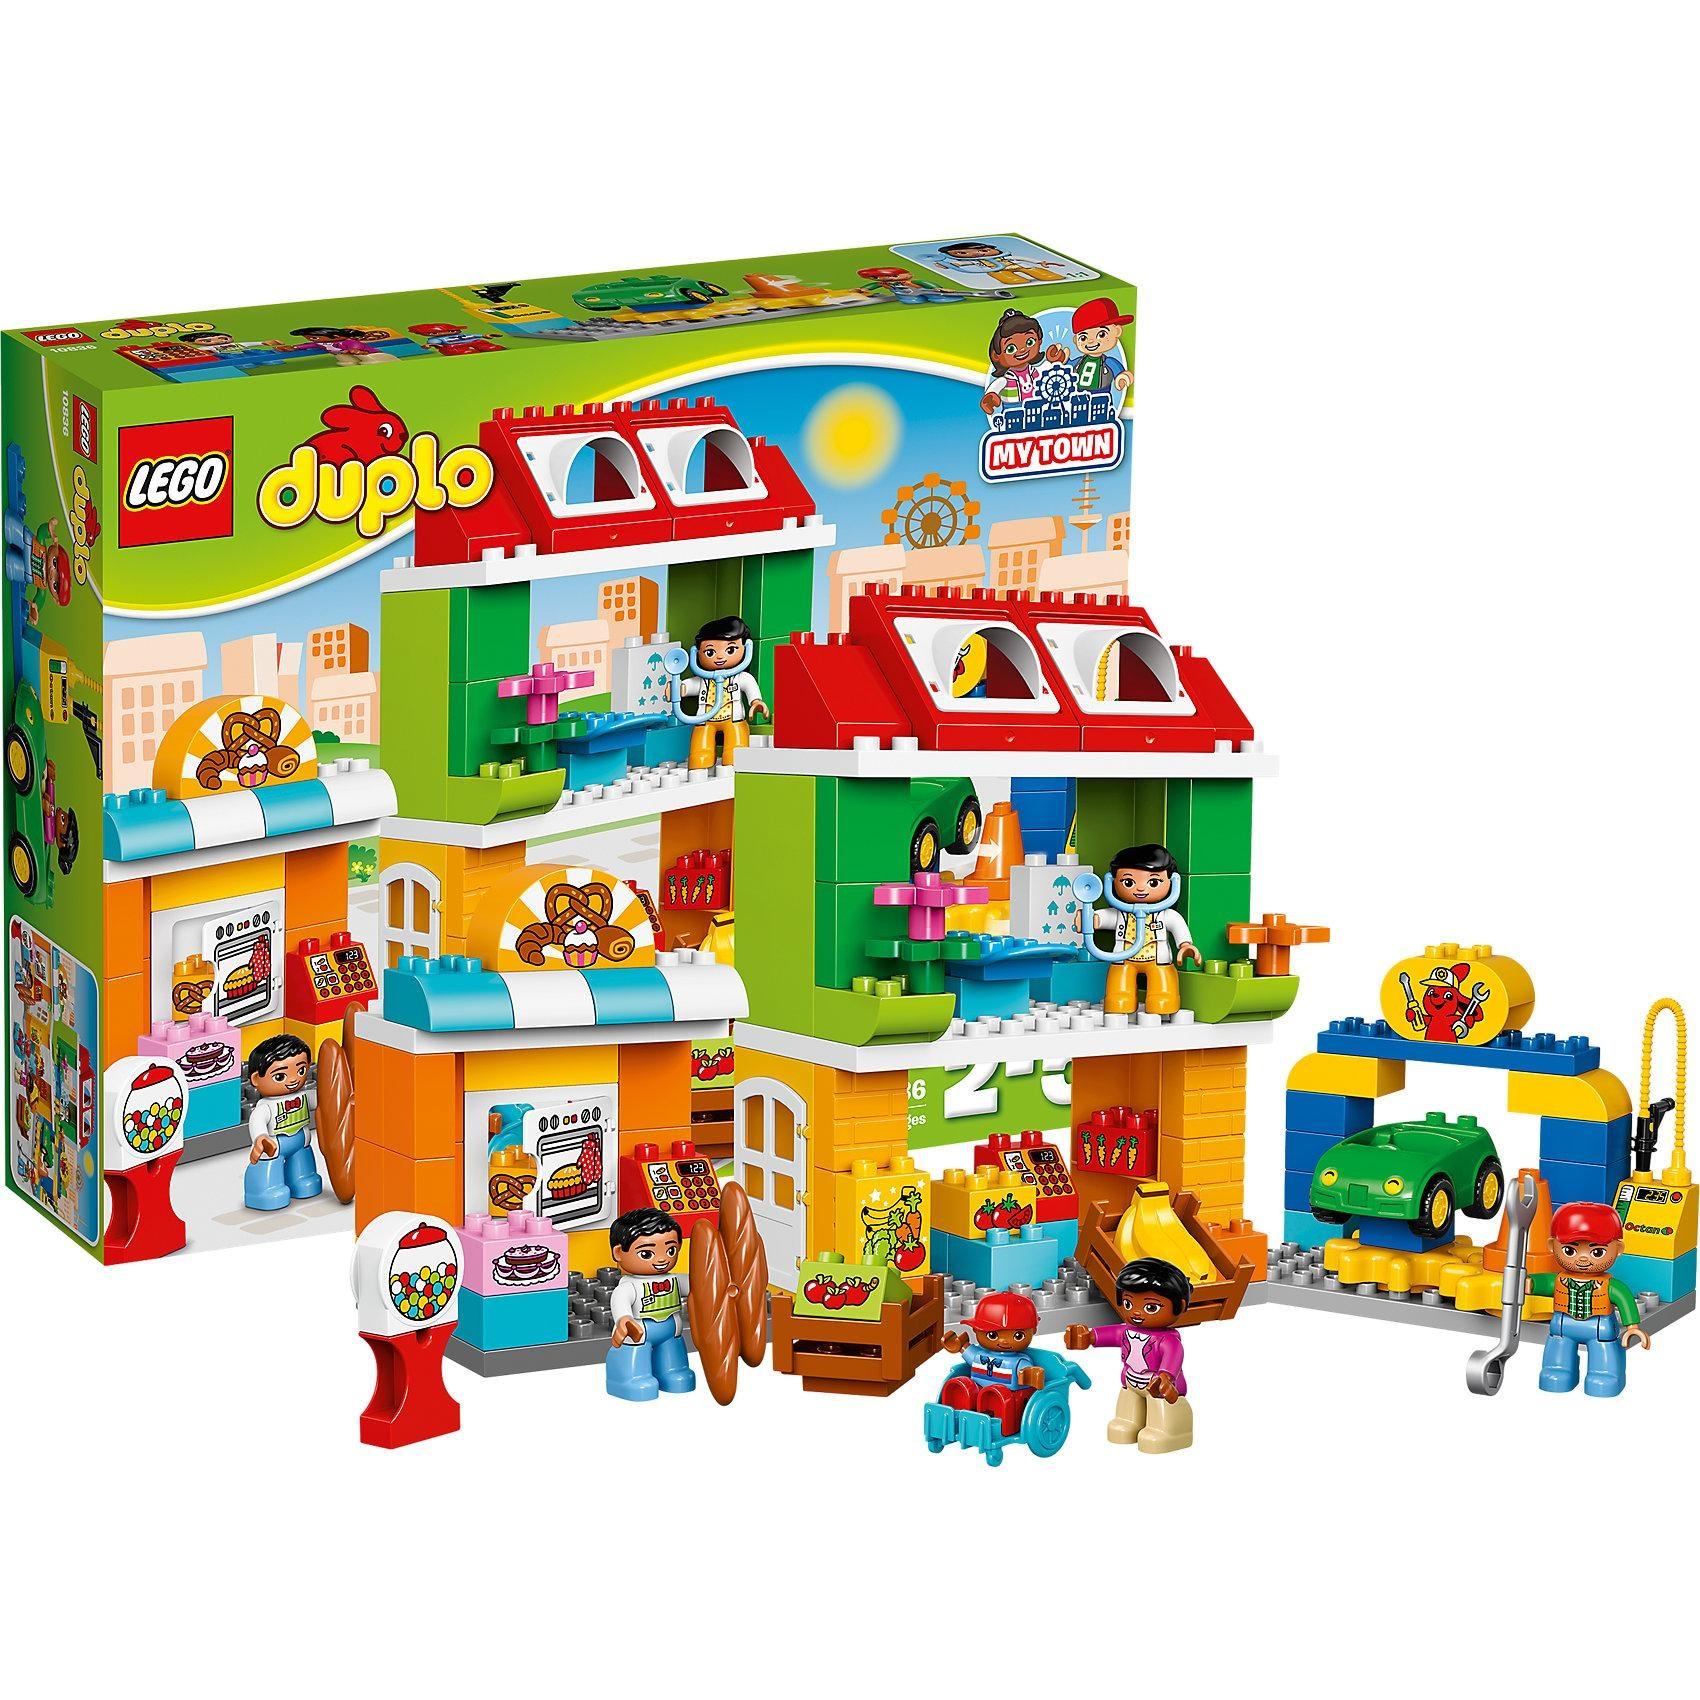 Lego Duplo 10836 Stadtviertel